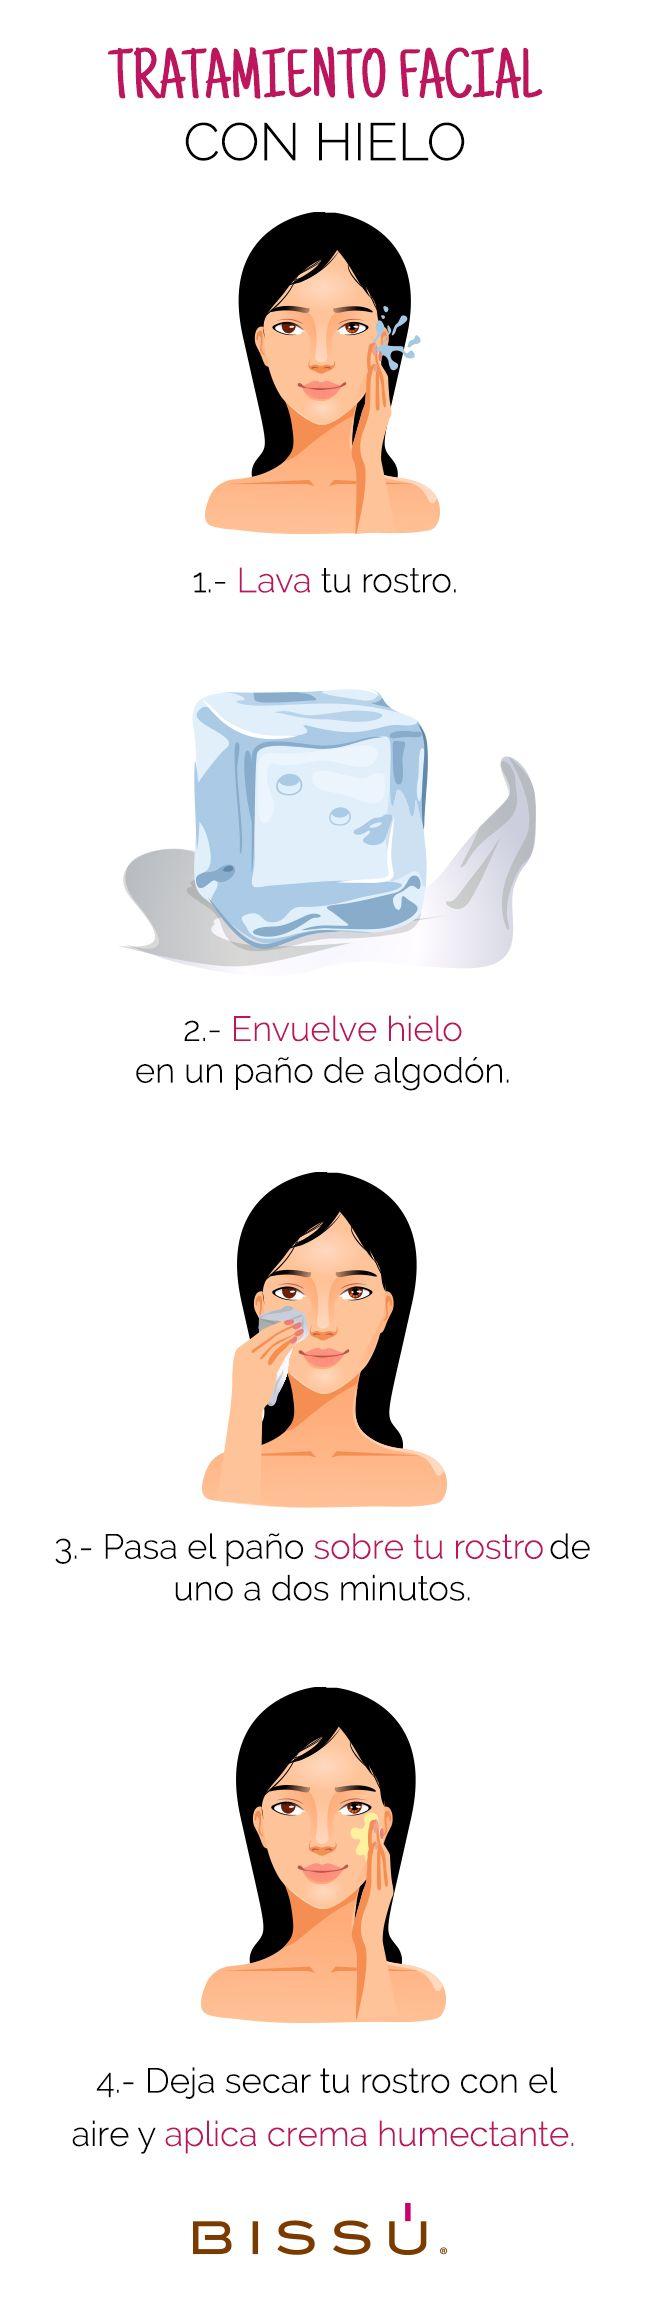 ¡Cuida y rejuvenece tu rostro! http://tiendaweb.bissu.com/